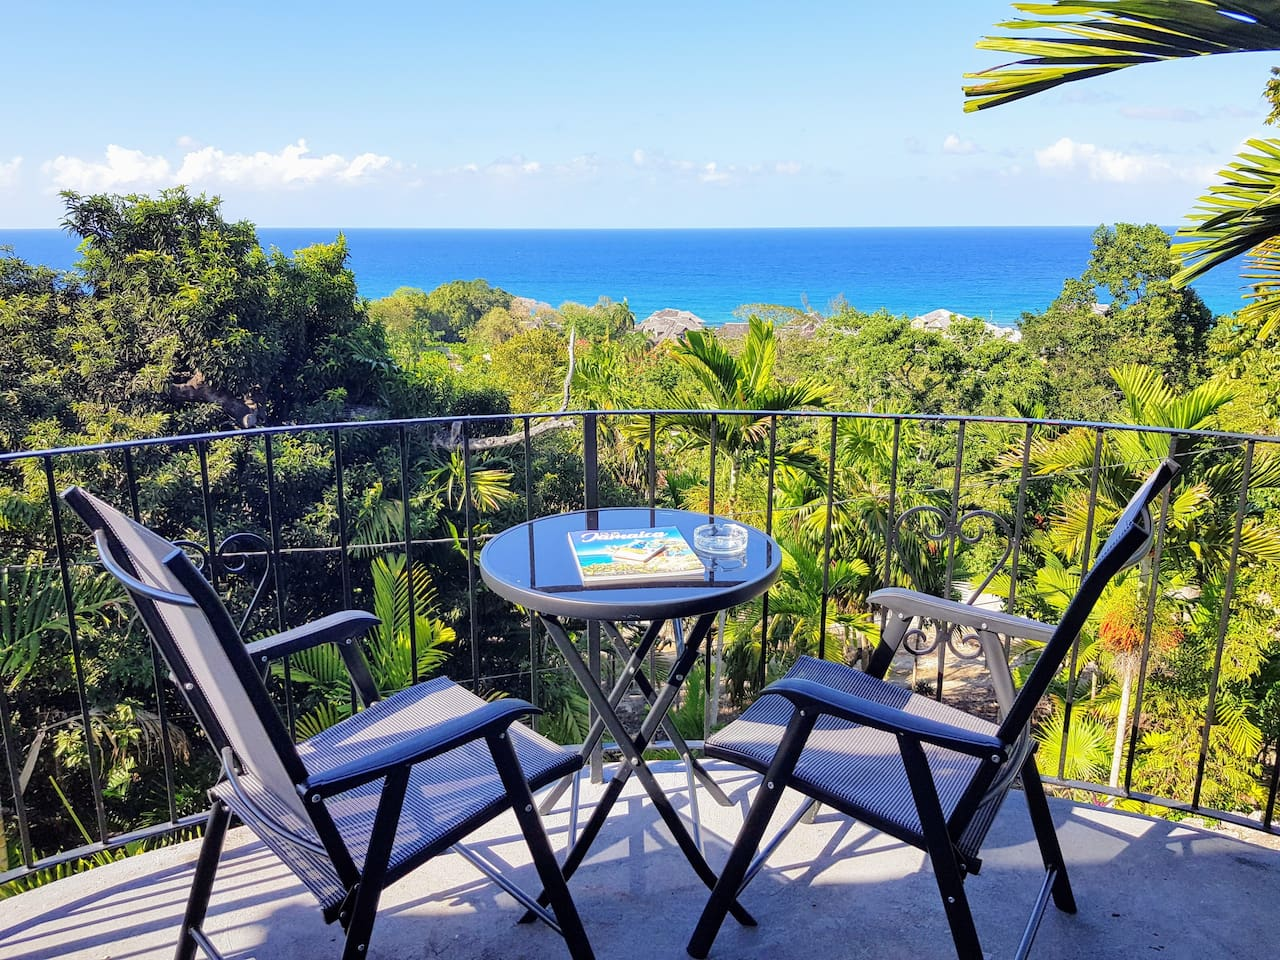 Wake up to Panoramic Ocean Views of the Caribbean Sea!